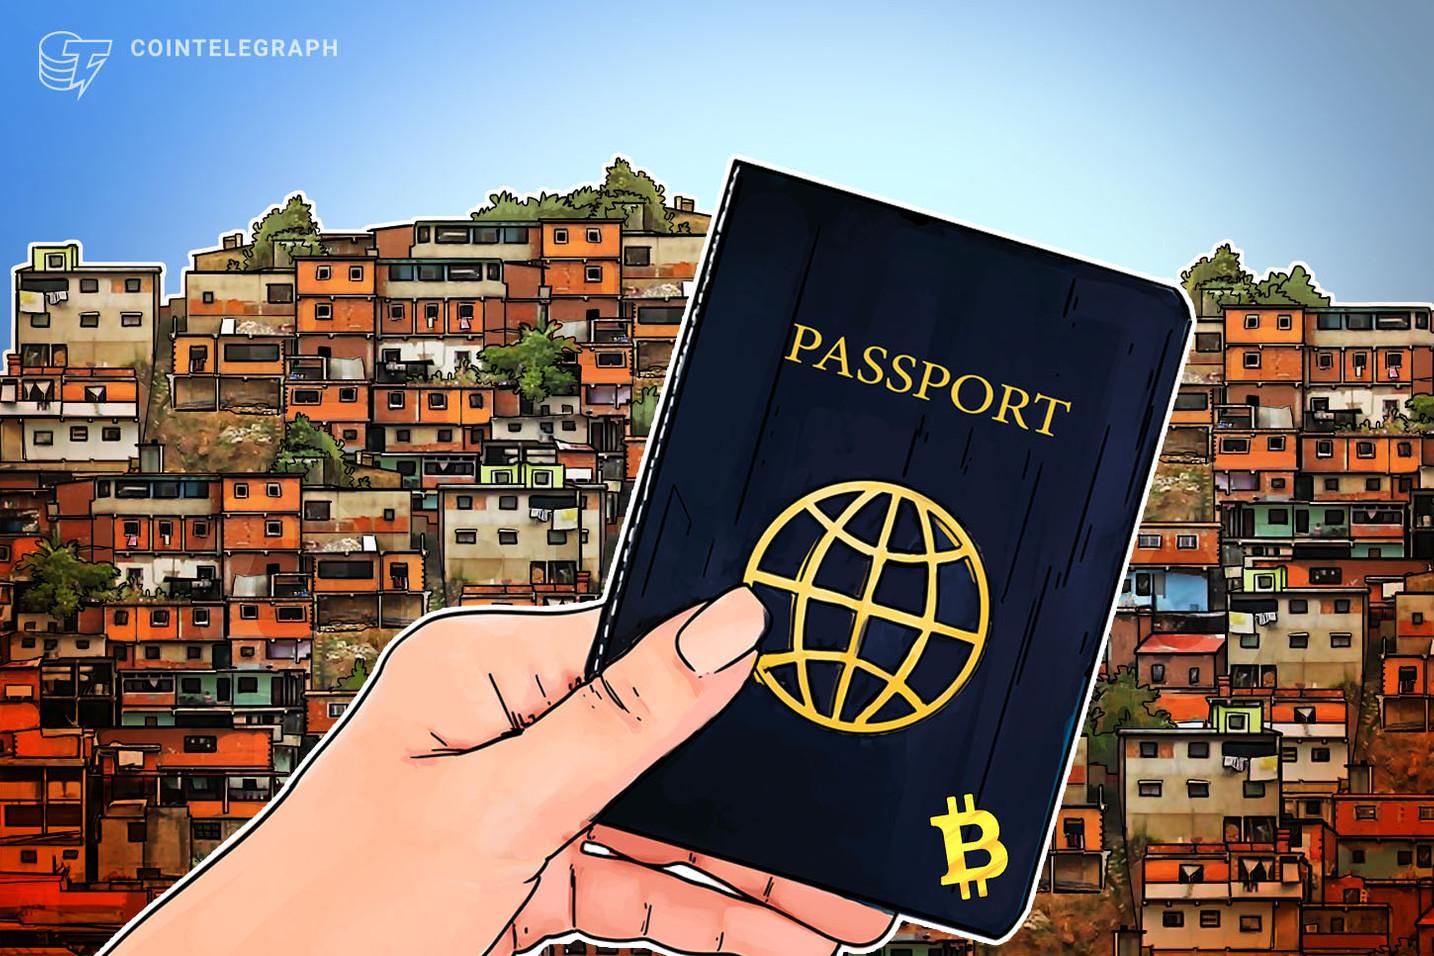 Investidores tentam bloquear passaportes de líderes da G44 Brasil e pedem dados sobre endereços de wallets com Bitcoin